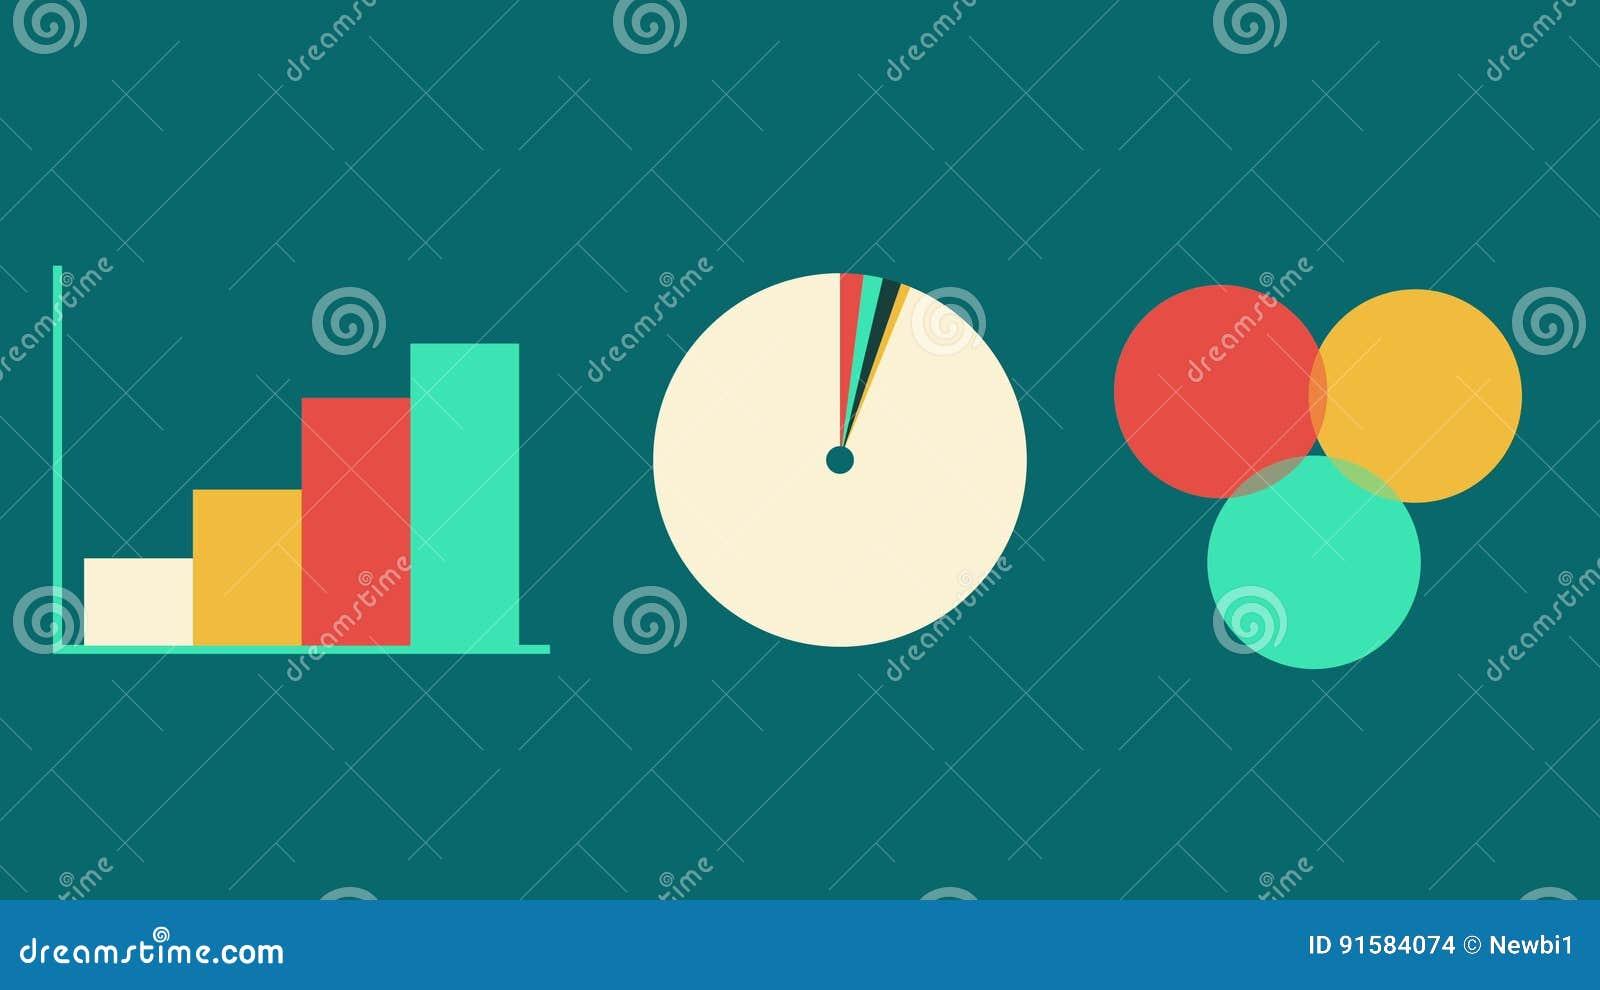 Venn diagram animation akbaeenw venn diagram animation ccuart Choice Image